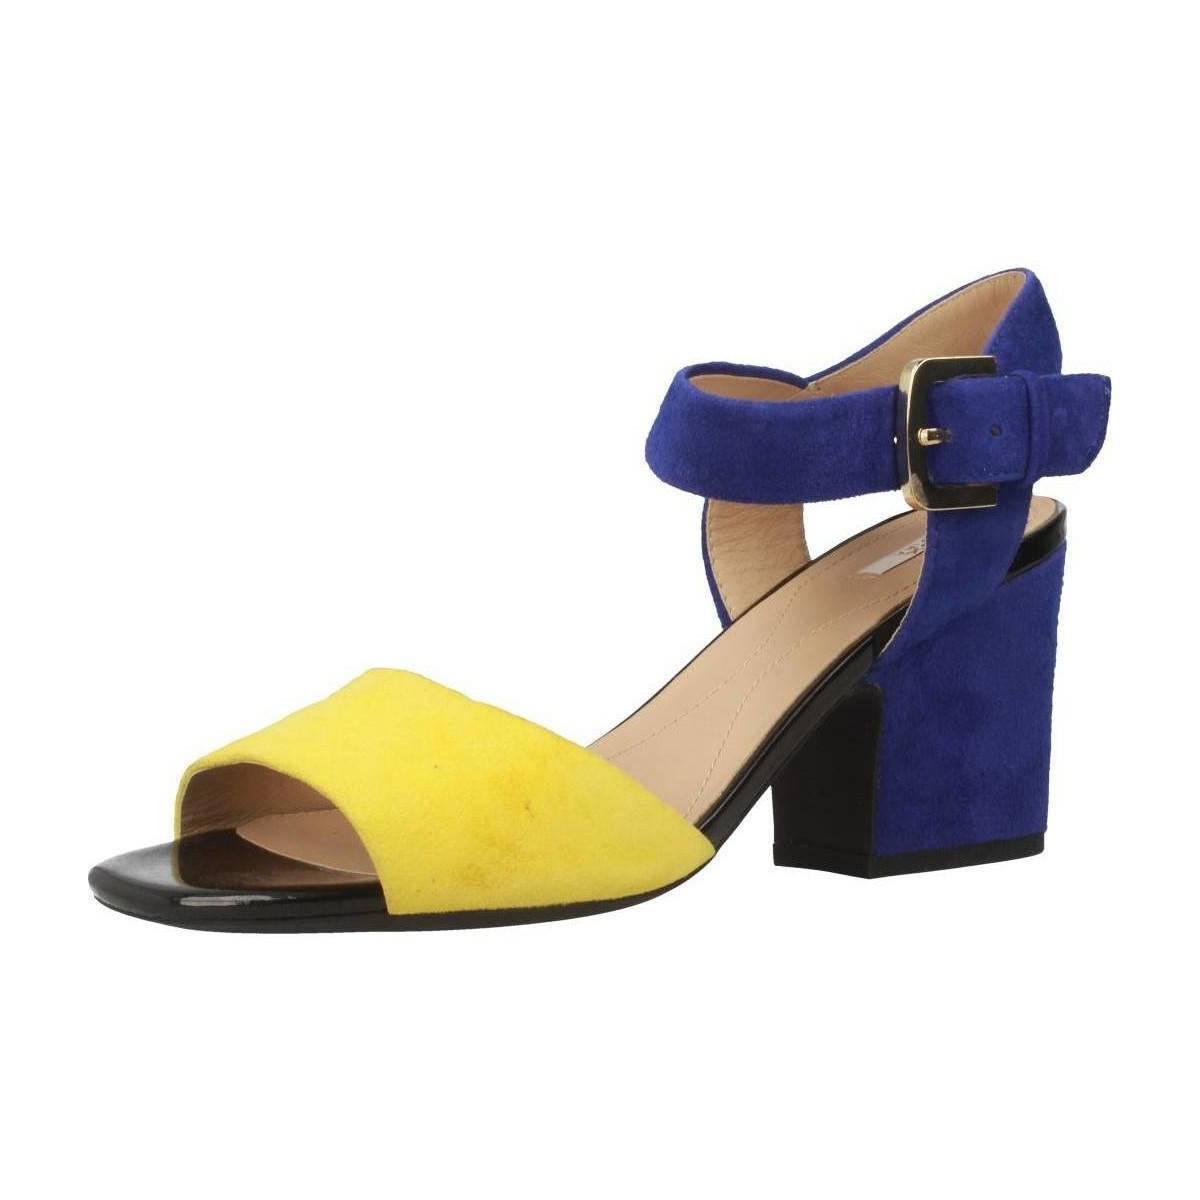 10efeb3b1f4 Geox D Marilyse Women's Sandals In Blue in Blue - Lyst